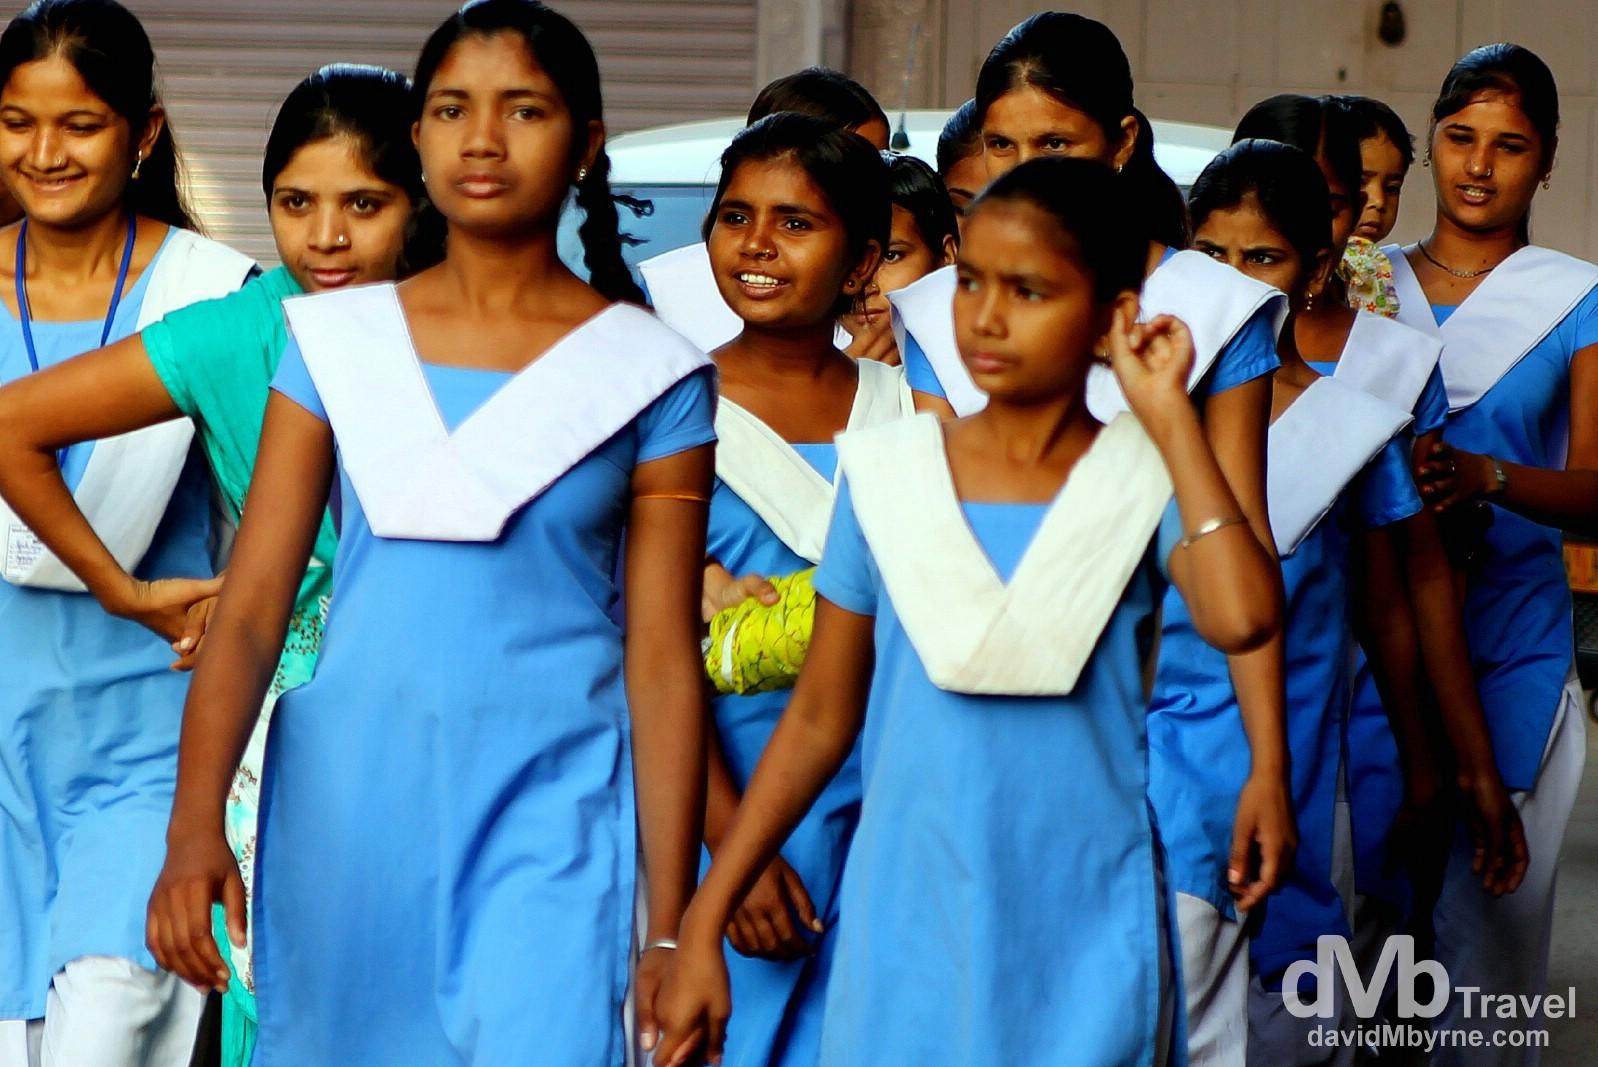 Schoolgirls on the streets of Bundi, Rajasthan, India. October 2nd 2012.